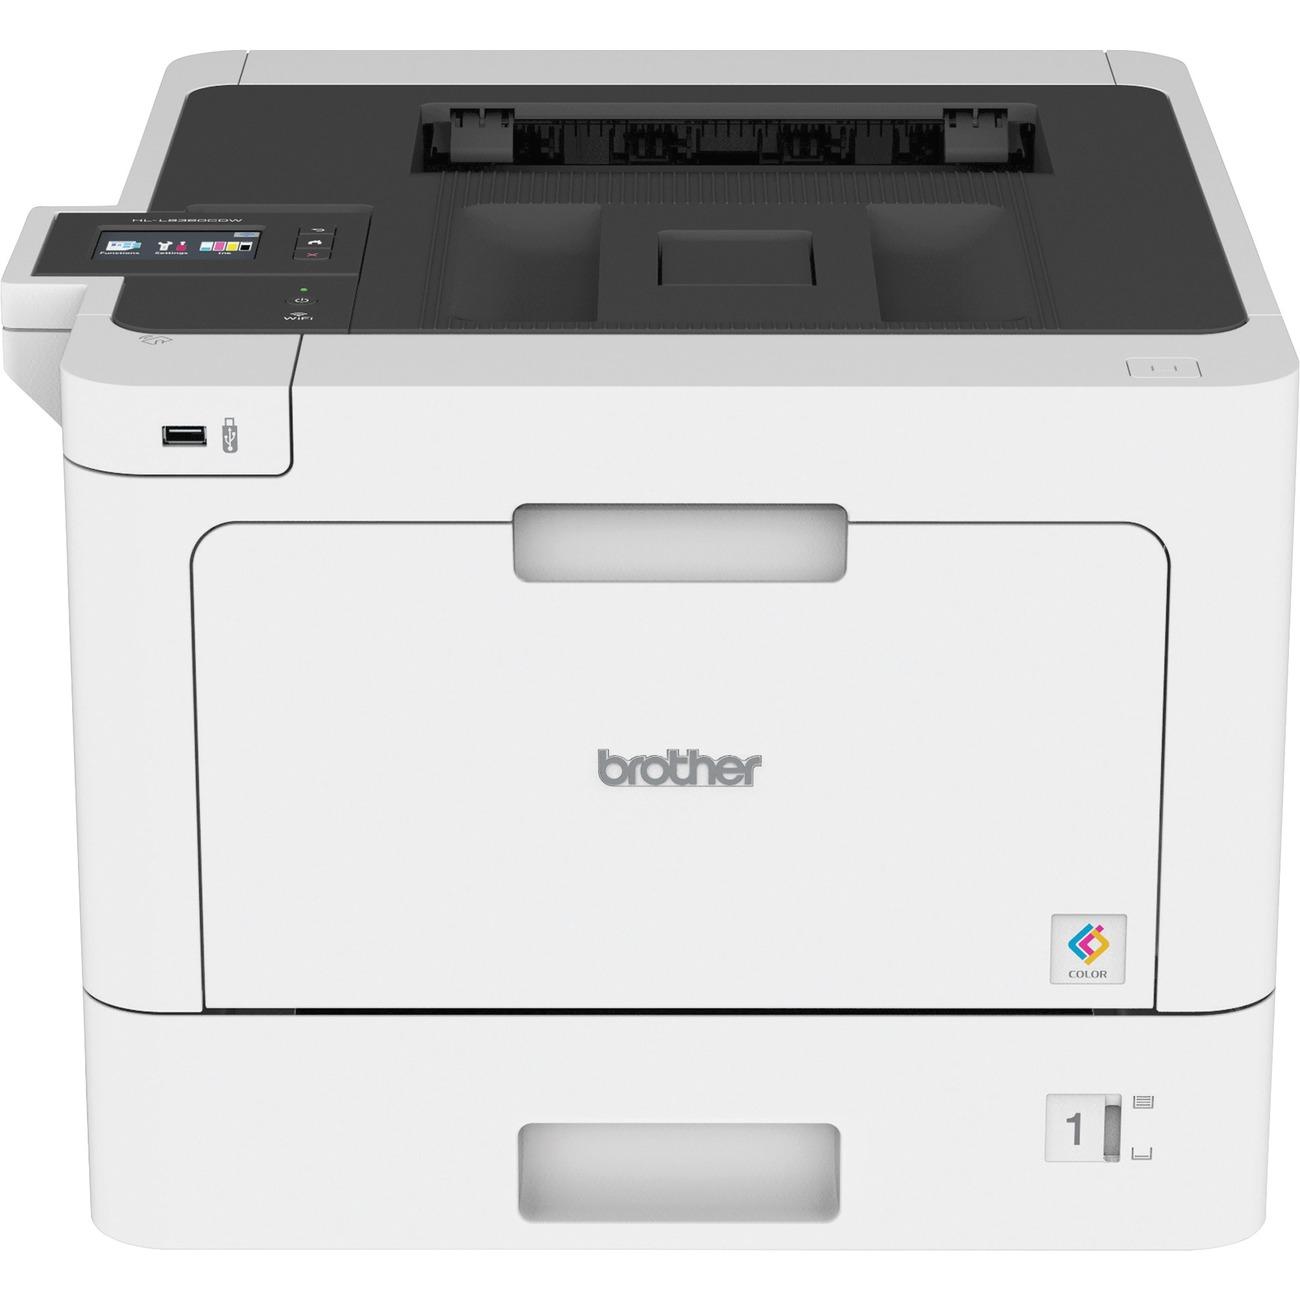 Brother Business Color Laser Printer HL-L8360CDW - Duplex - Color Laser  Printer - 33 ppm Mono / 33 ppm Color - Ethernet - Wireless LAN - USB 2 0